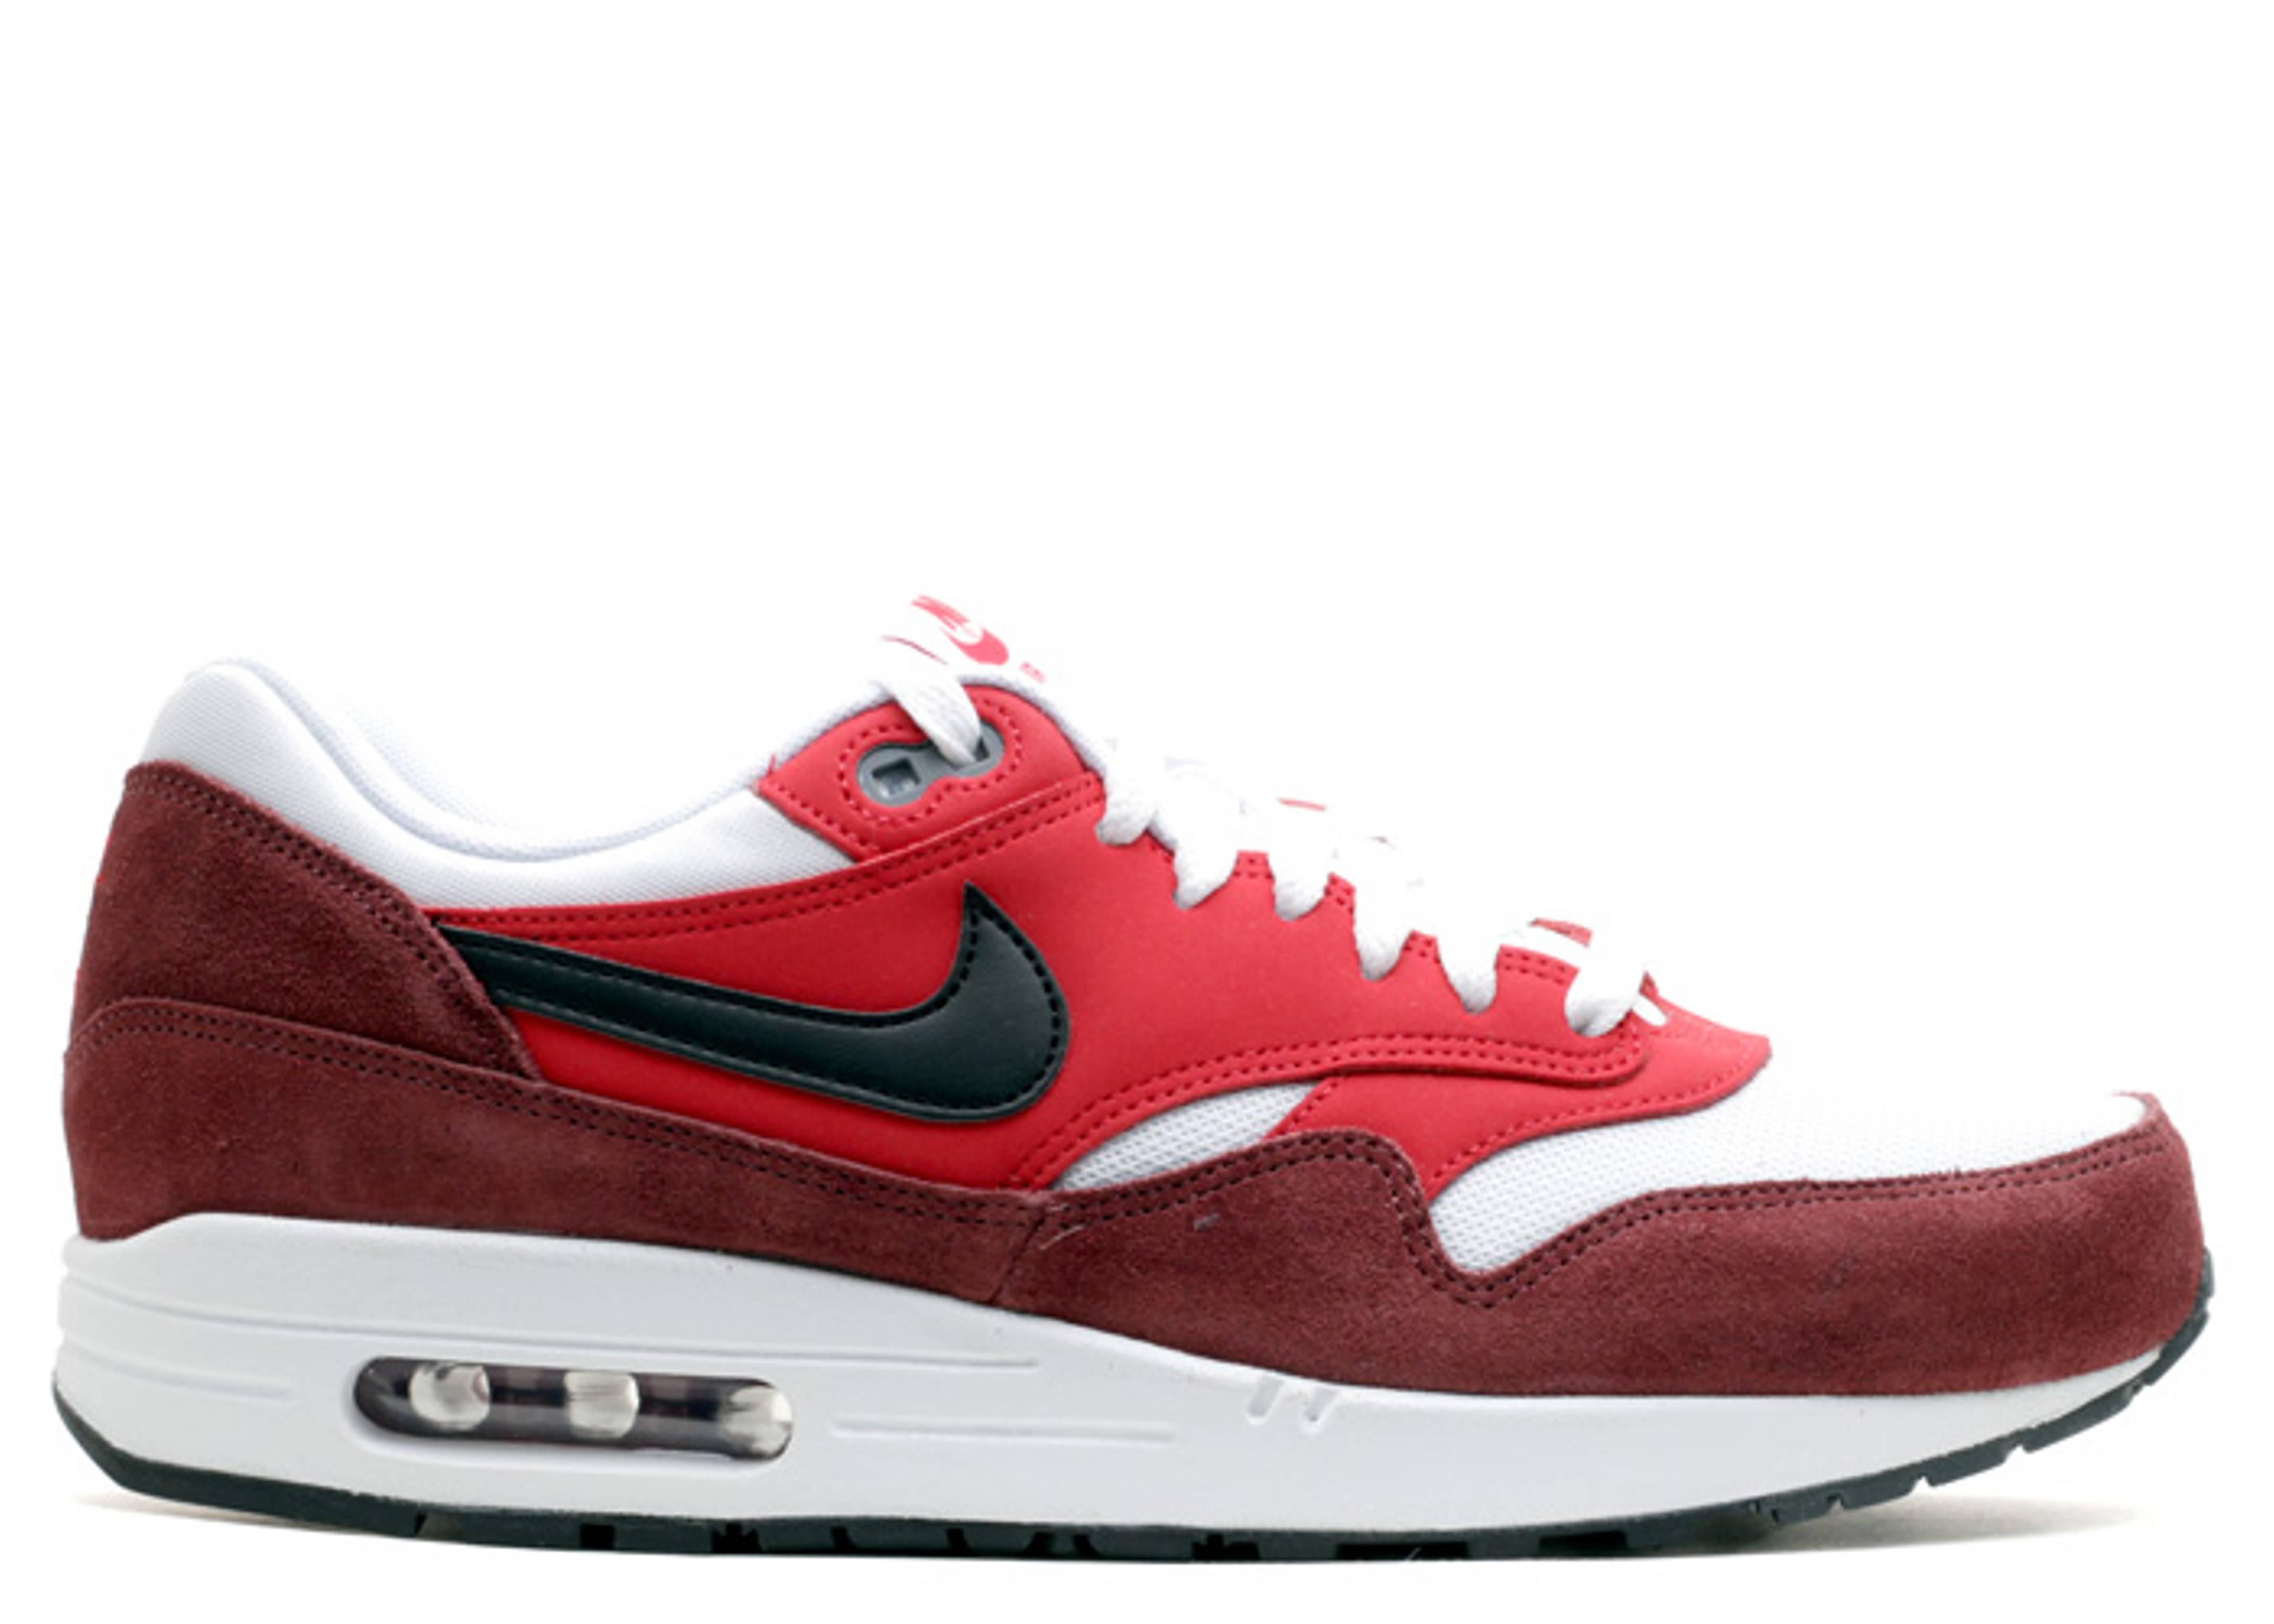 Air Max 1 Essential 'University Red Black' - Nike - 537383 116 ...